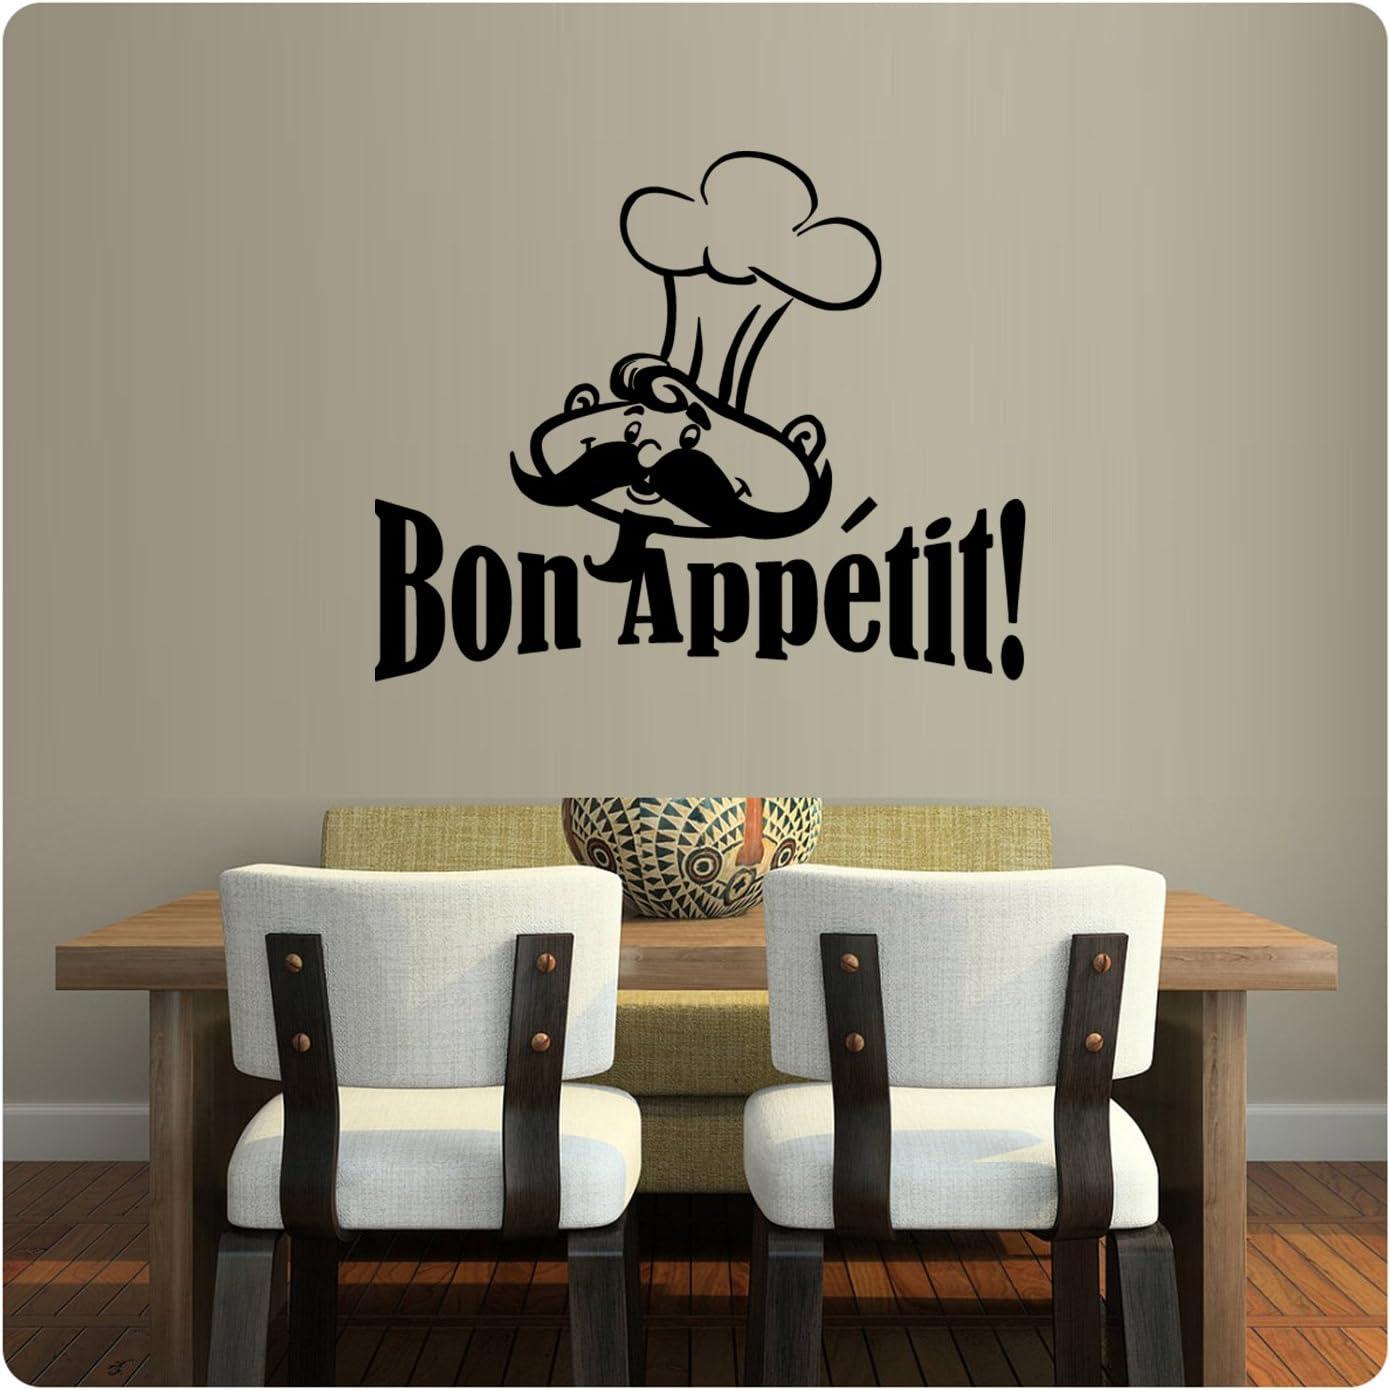 Huhome PVC Wall Stickers Wallpaper English Bon Appetit Bon Appetit French Kitche